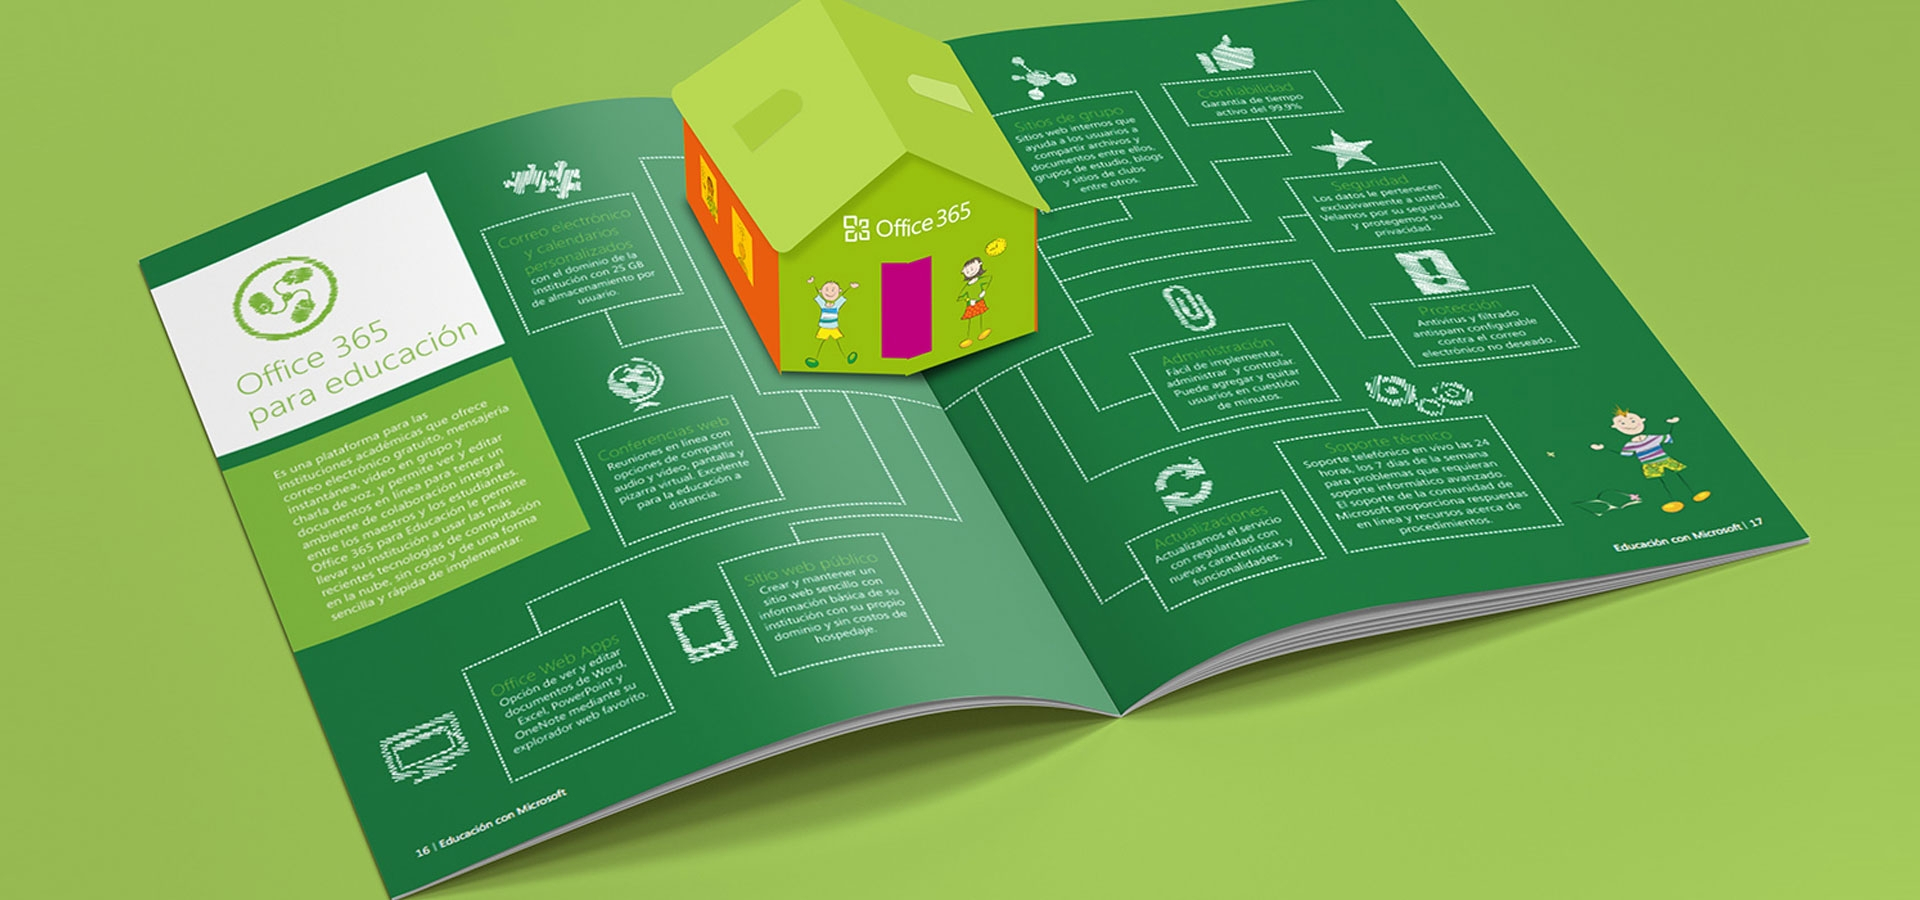 19+ 3D Pop Up Brochure Designs | Free & Premium Templates Within Pop Up Brochure Template